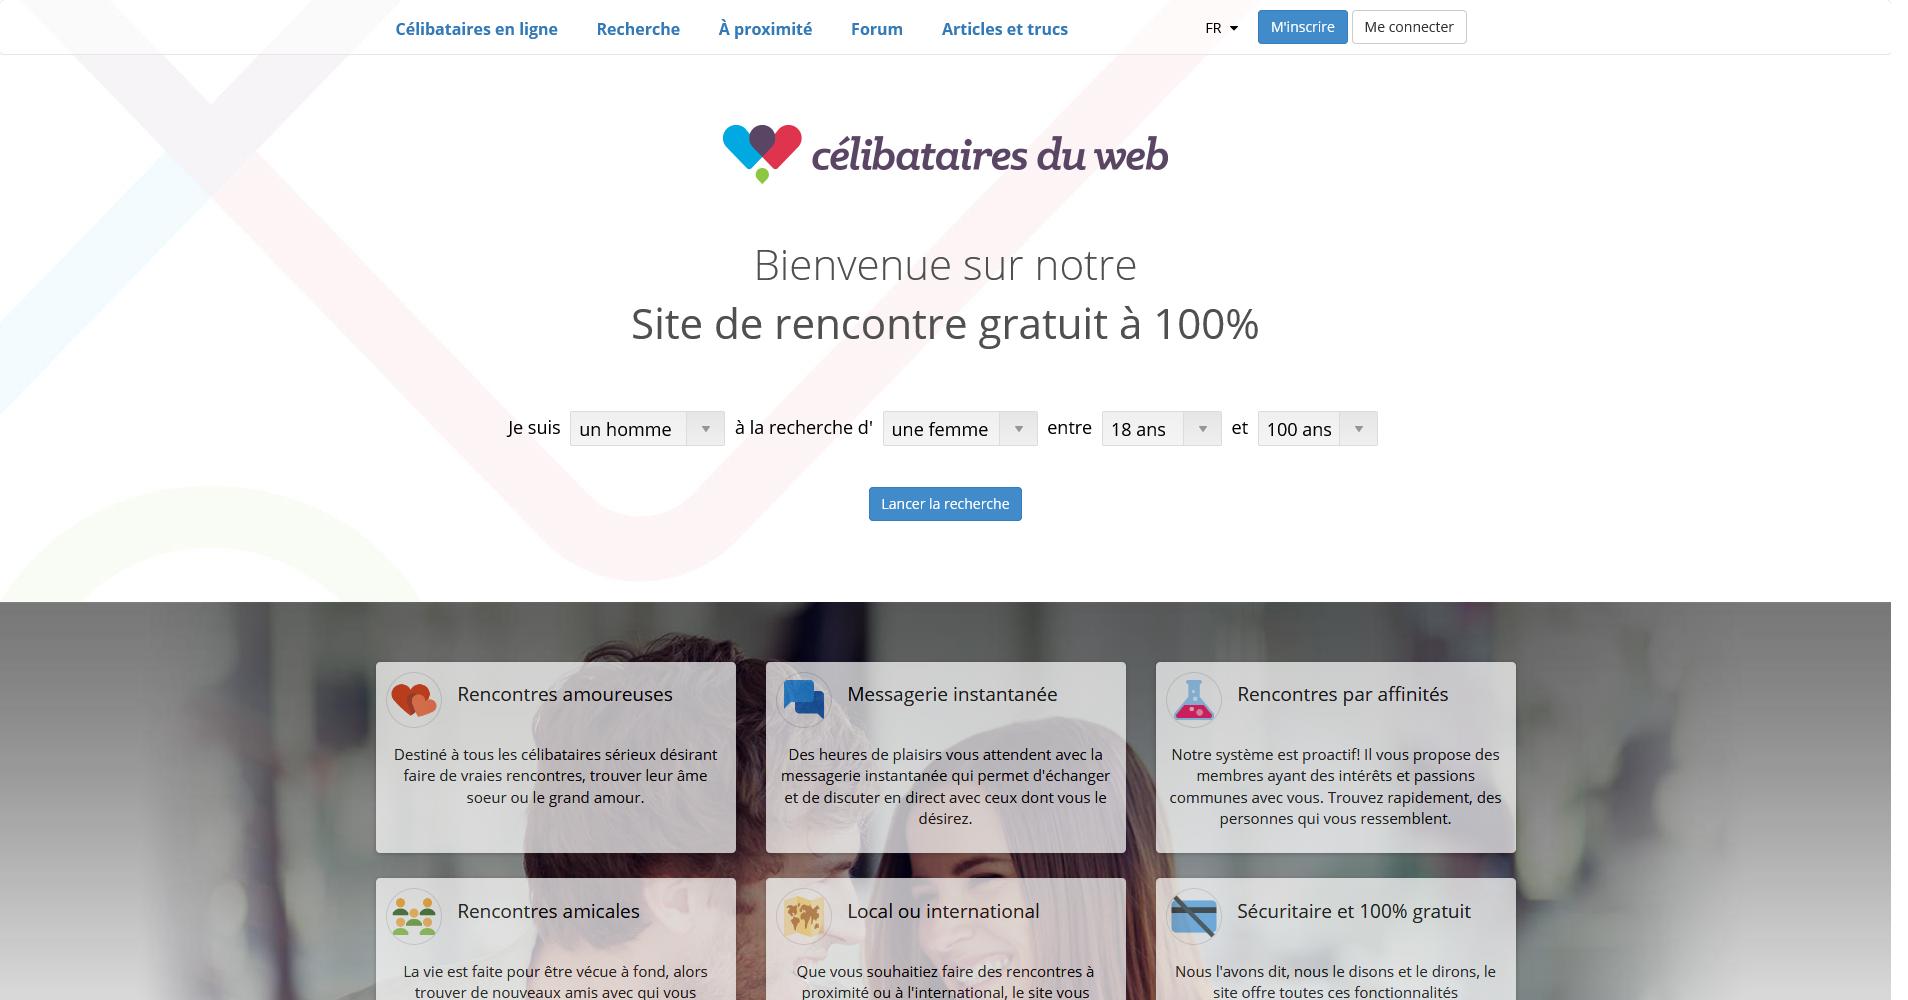 celibatairesduweb_com